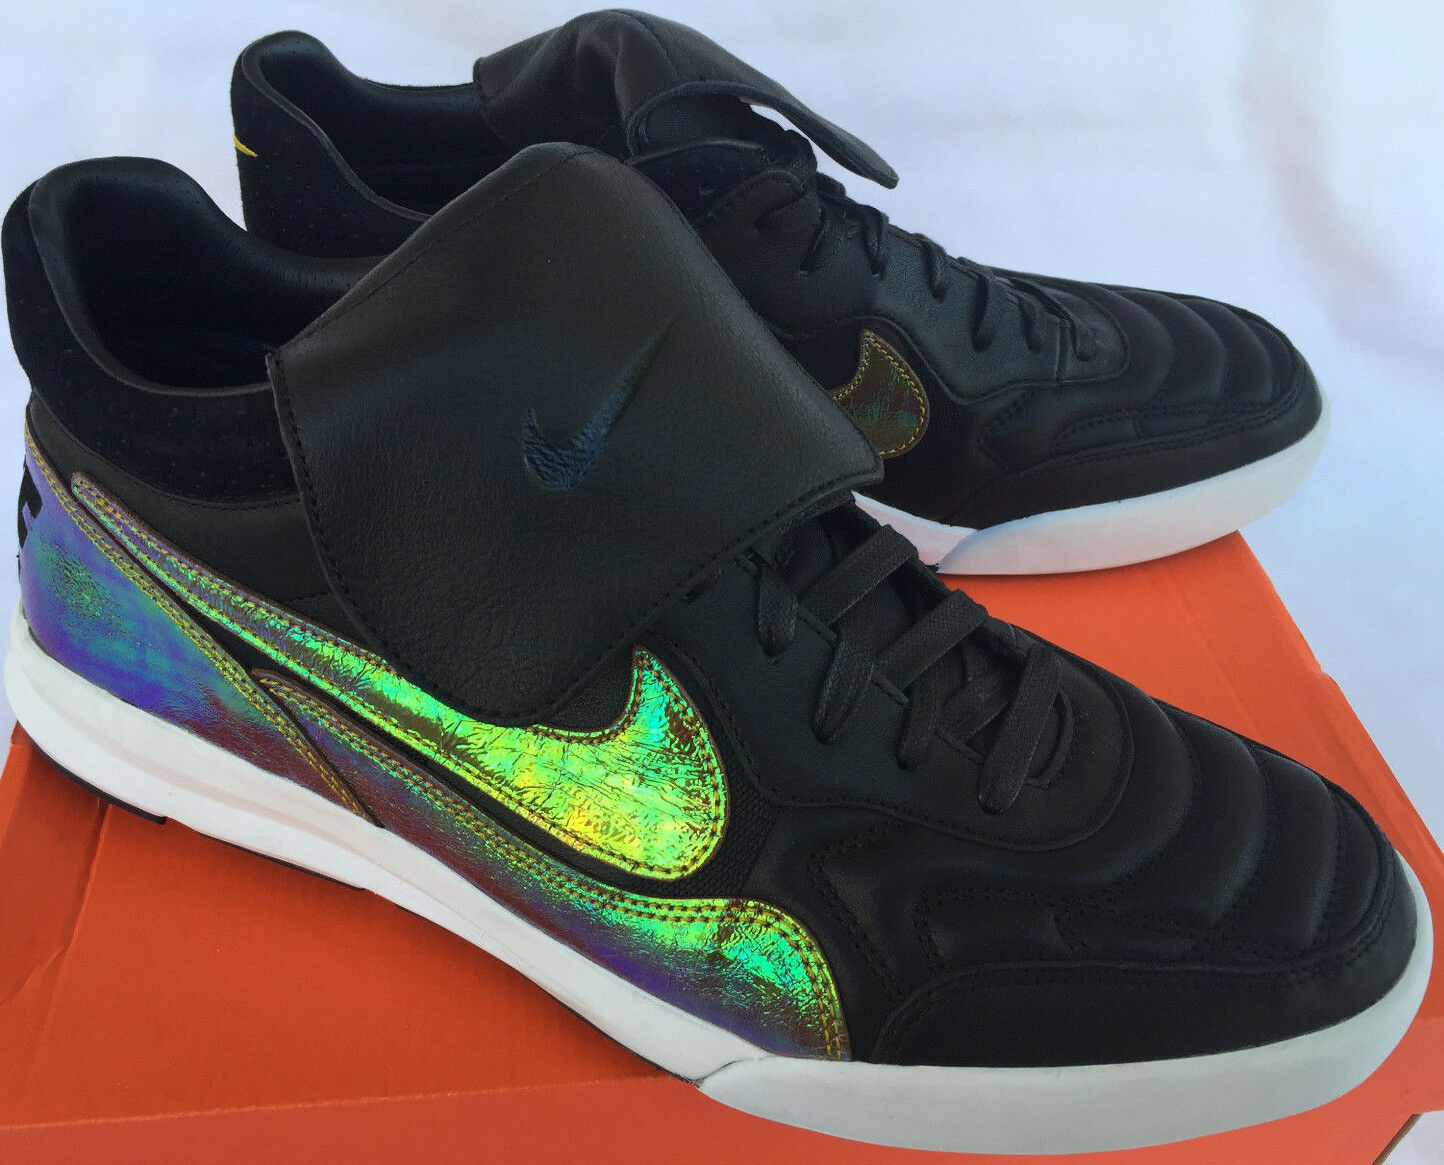 Nike Tiempo NSW Tiempo Nike '94 Lunar Mid TP QS 669908-003 Soccer Chaussures  Hommes 8.5 Futbol new 24f950